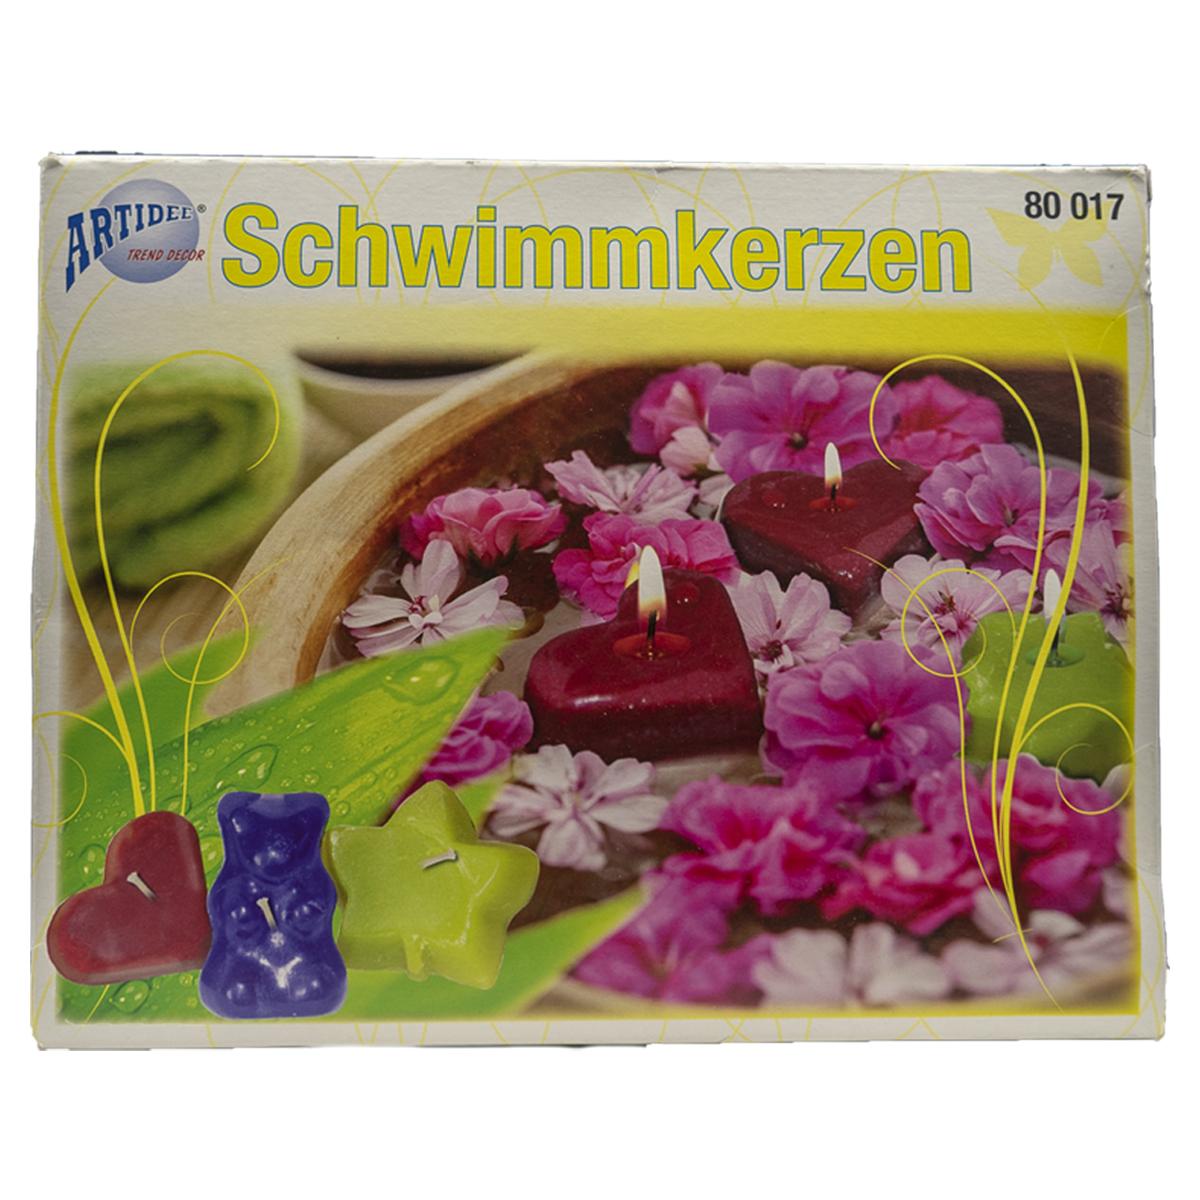 CREARTEC Kerzen selber machen  Sets - Bienenwachskerzen Gel Kerzen Teelichter Pyramidenkerzen - Made in Germany